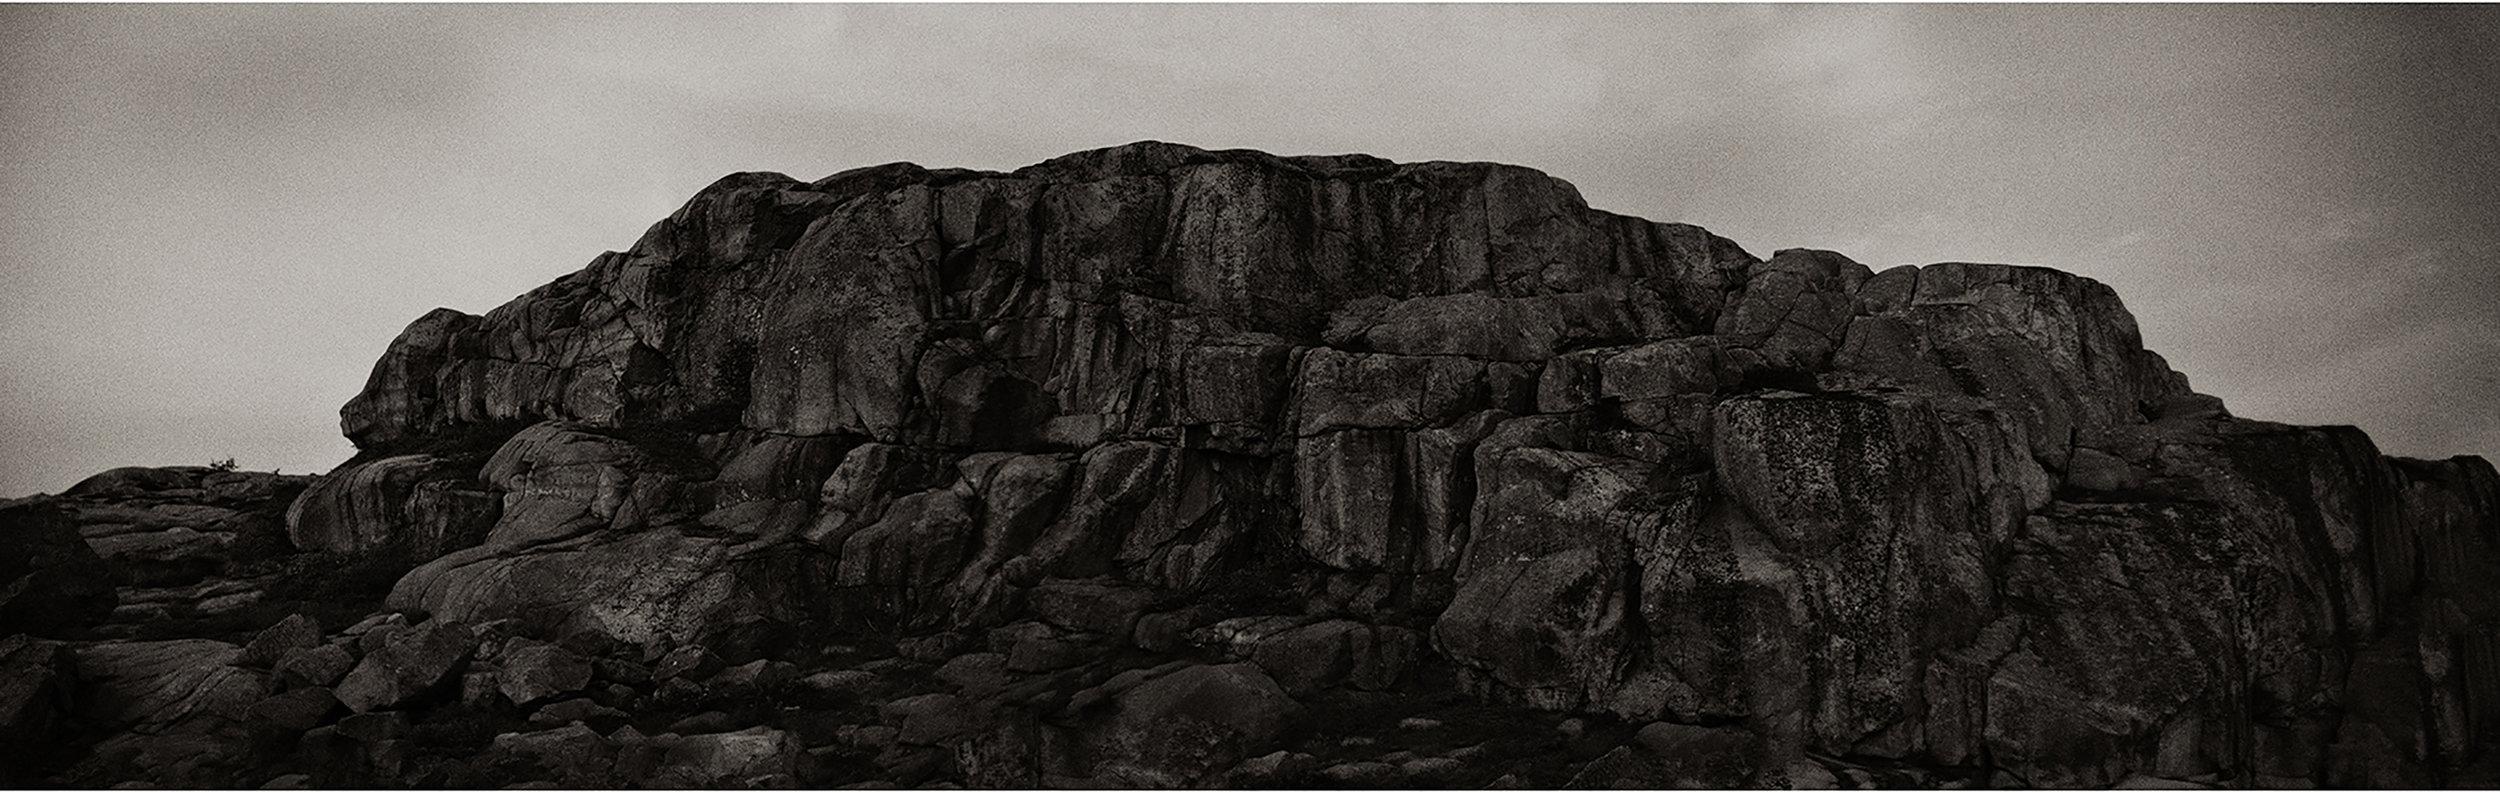 Fotografi, %22Berget%22, 2013, Fine Art Print, 36x104 cm, edition 6.jpg